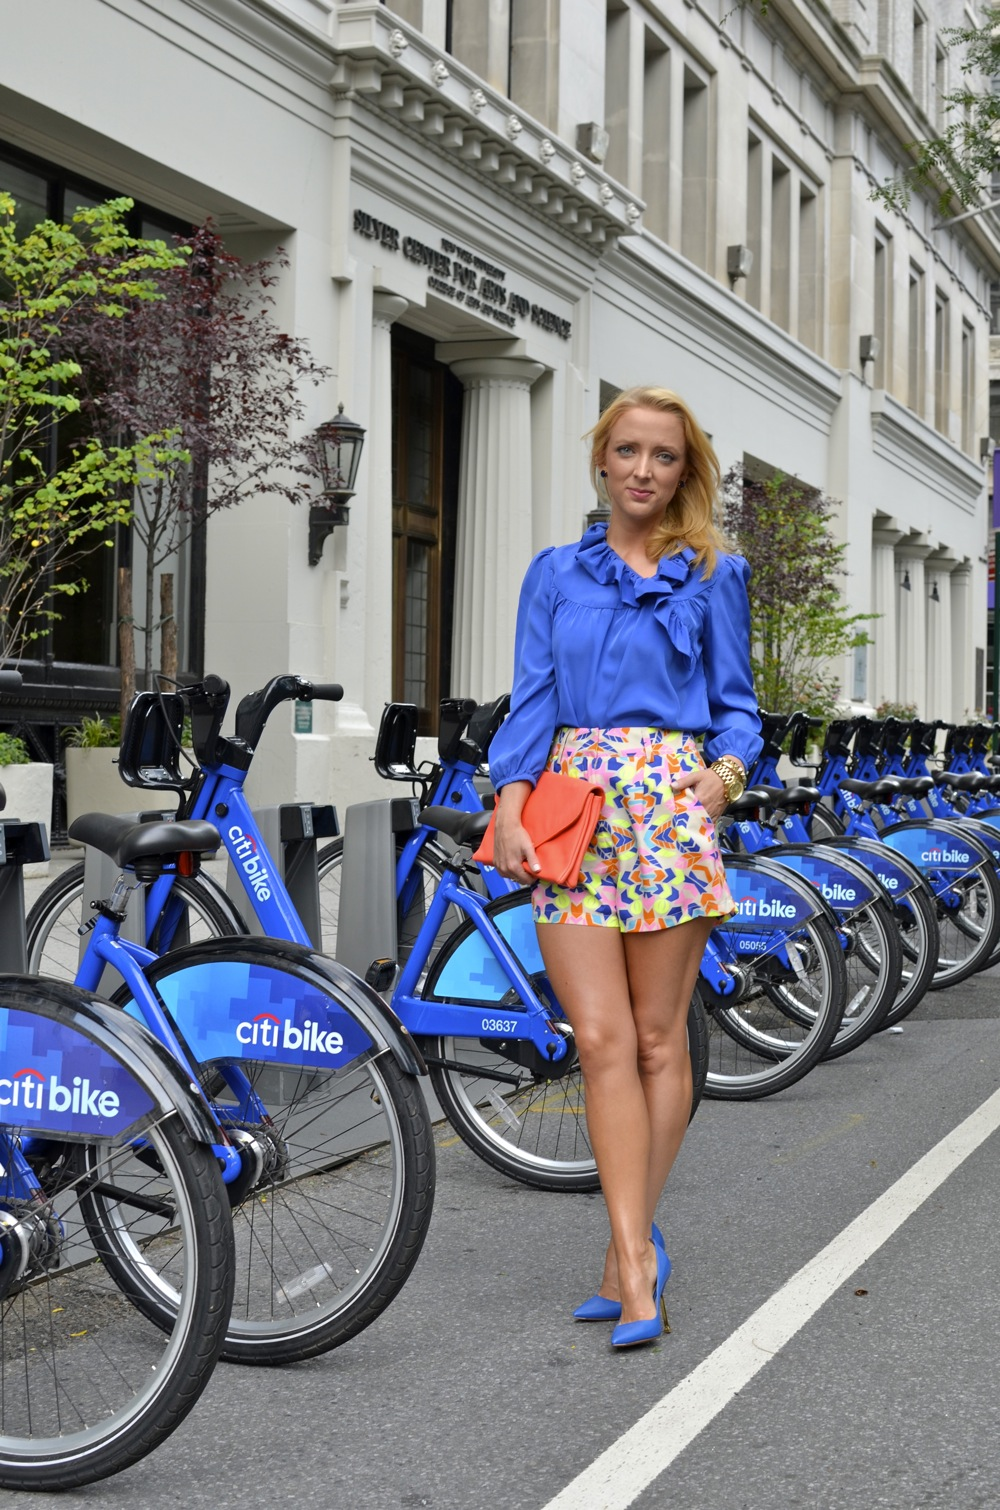 bike pretty, bikepretty, pretty bike, girls on bikes, cycle style, fashion bike, bike fashion, bike chic, bike style, girl on bike, cycle chic, new york city, bike share, citi bike